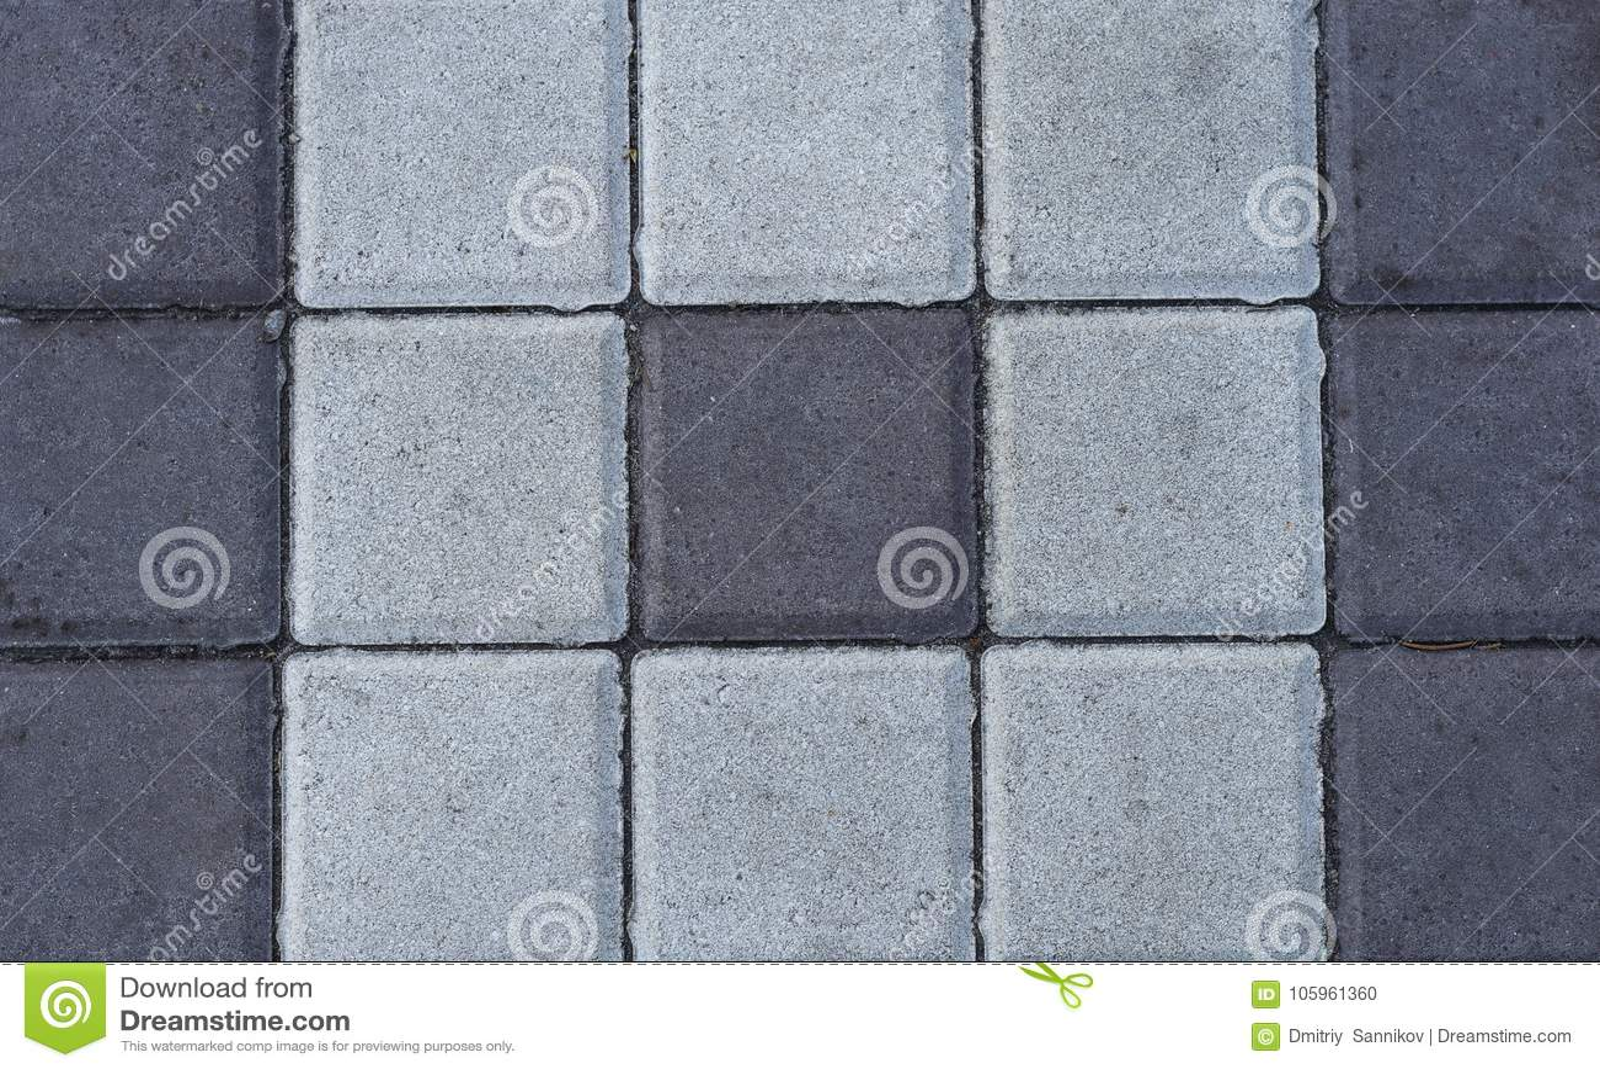 Stone paving tiles stock photo. Image of background - 105961360